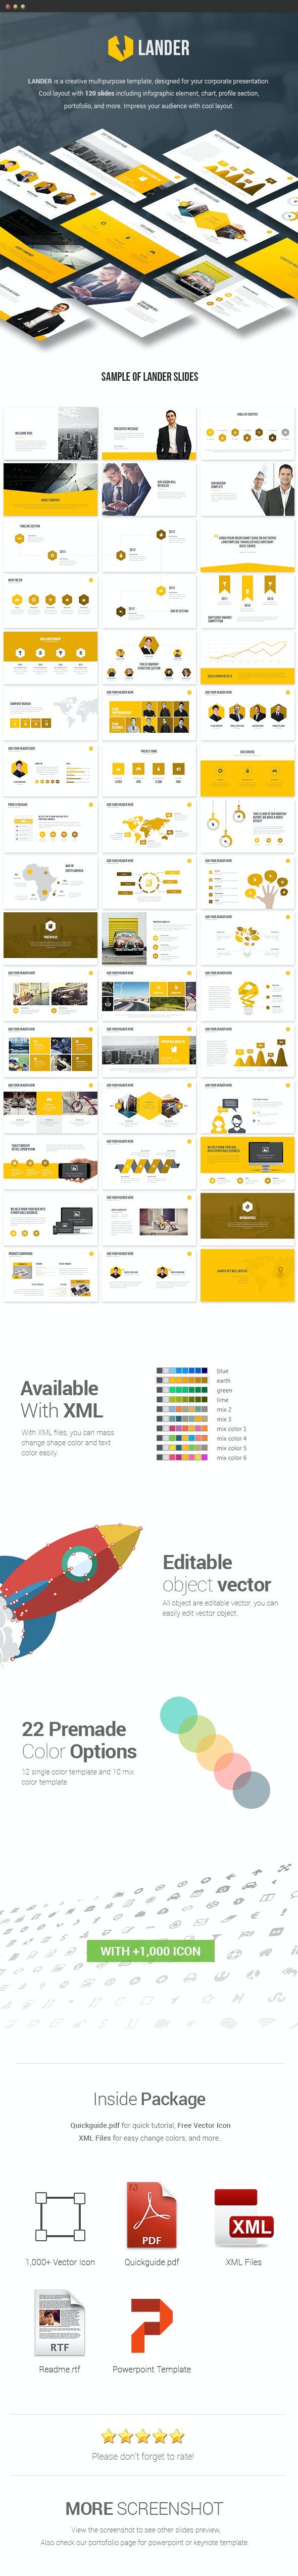 Lander - Powerpoint Template - Pitch Deck PowerPoint Templates